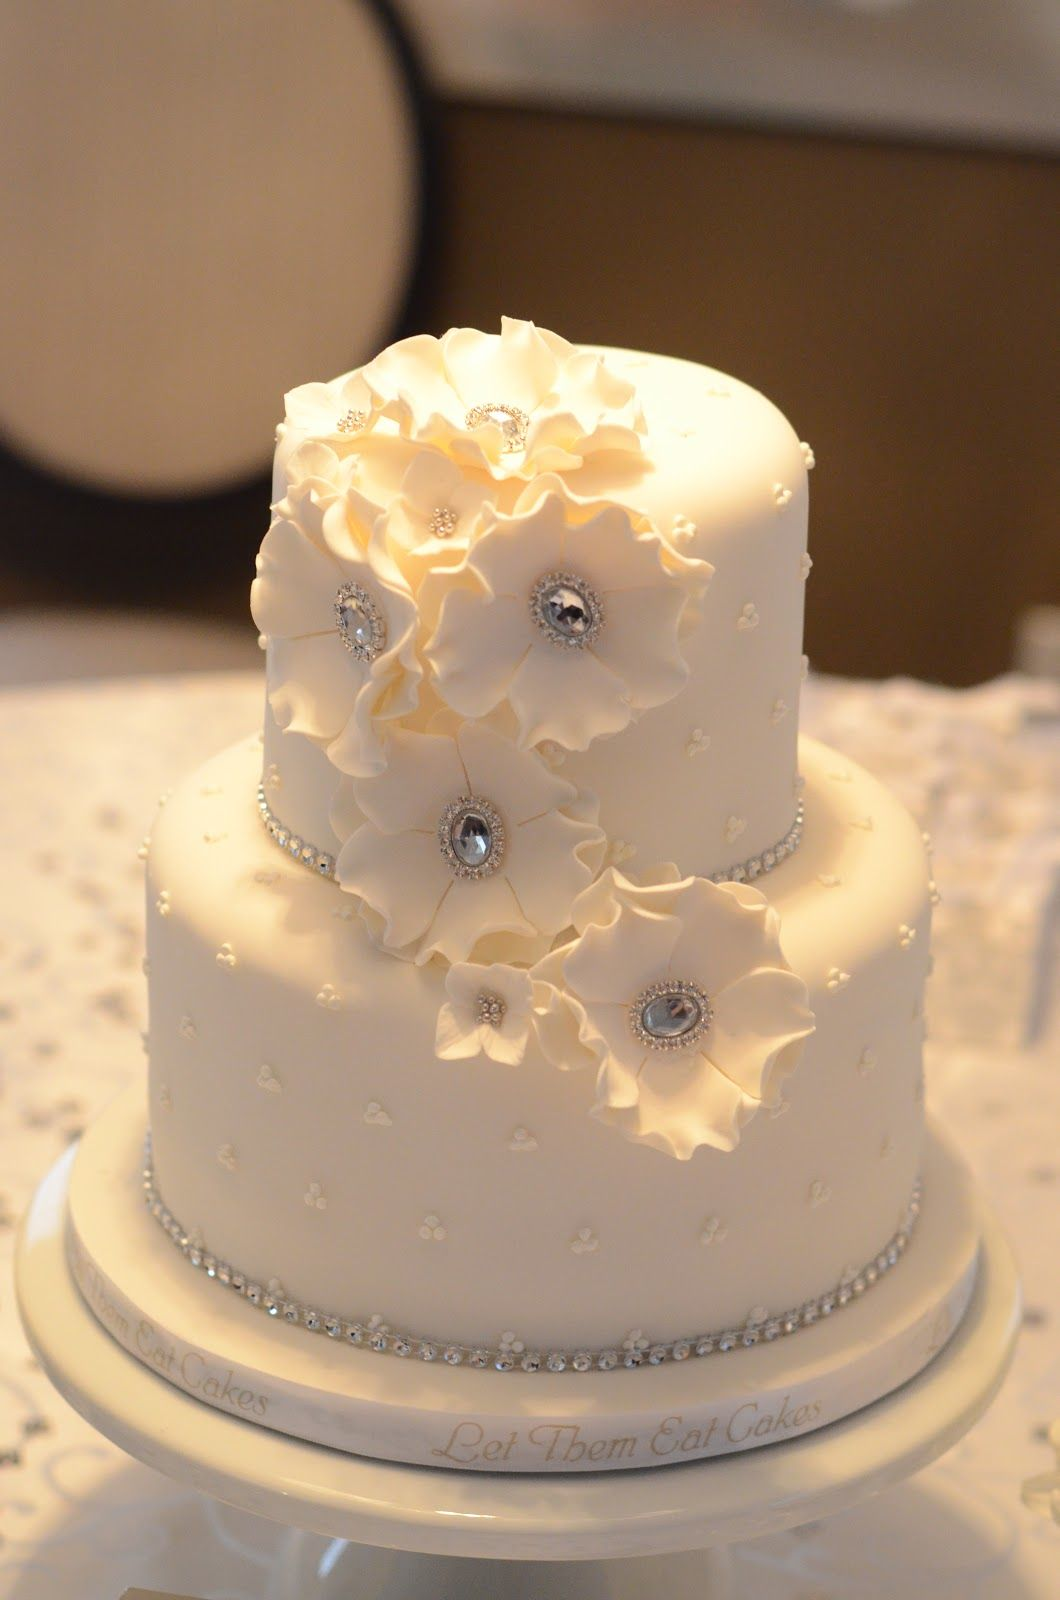 25th Anniversary Sparkle Wedding Anniversary Cakes 60 Wedding